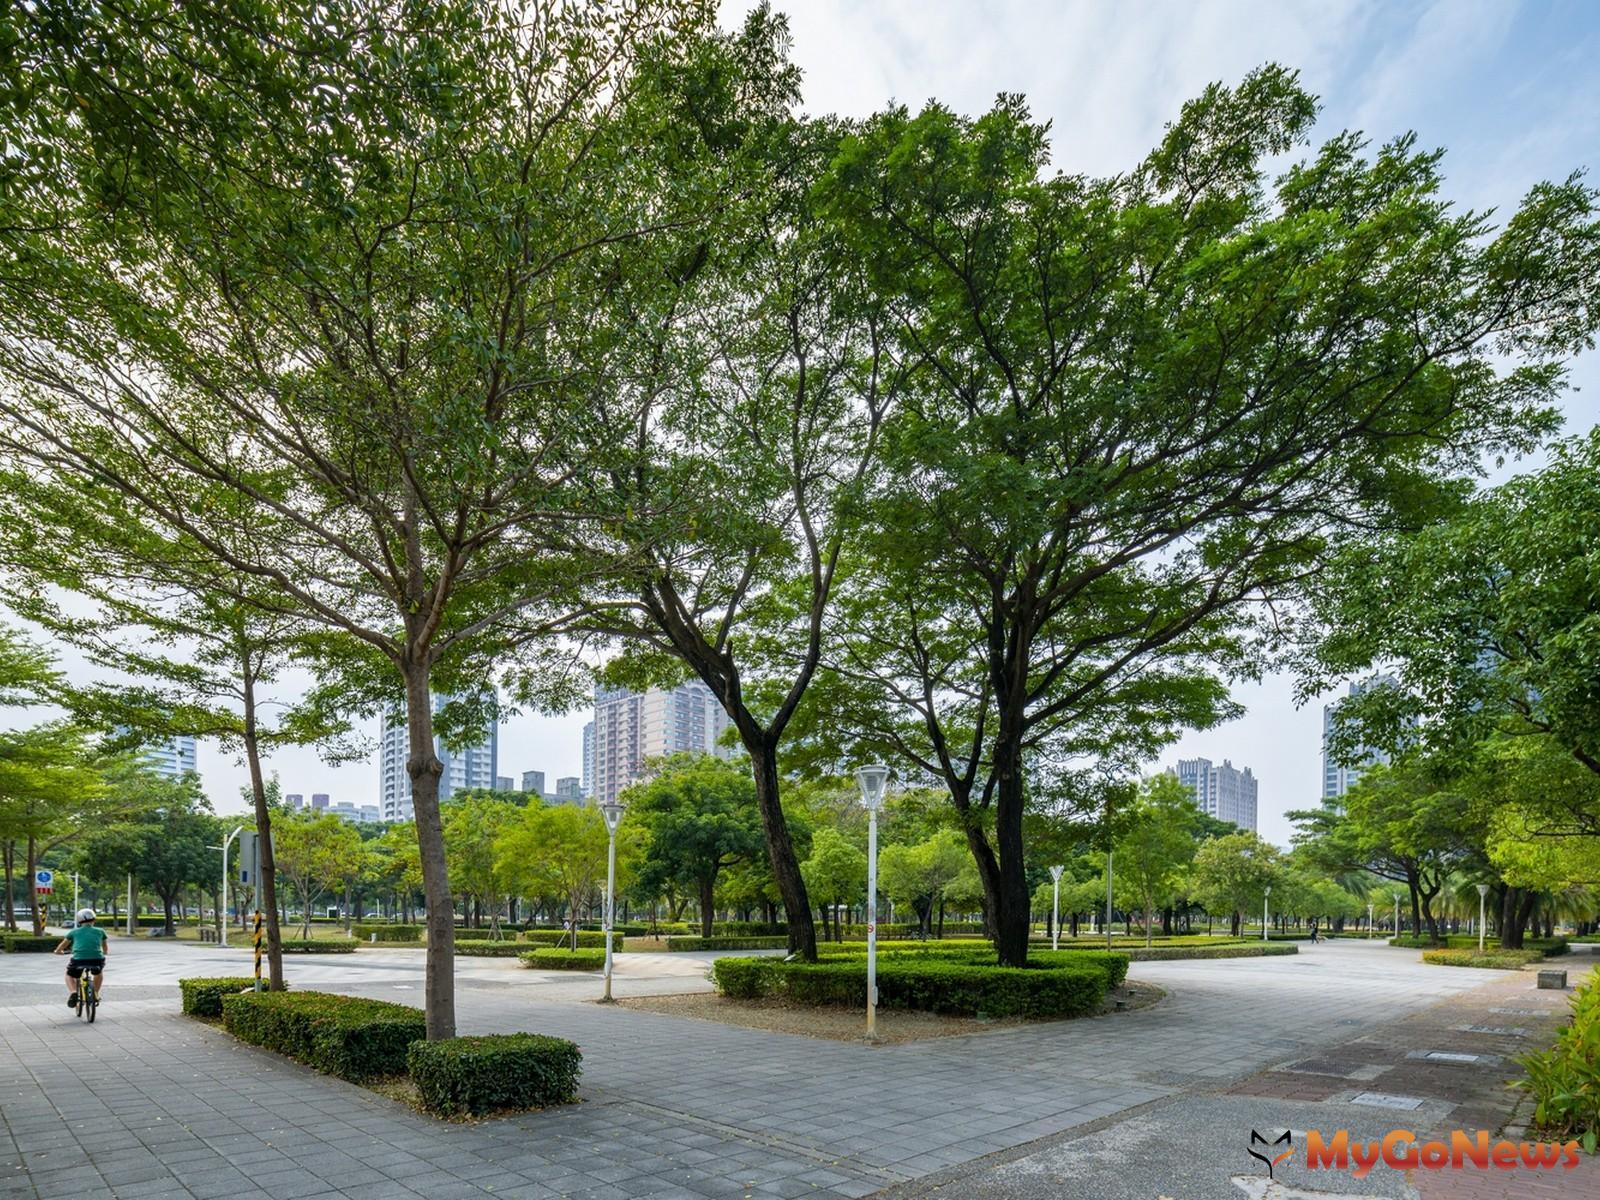 「J modern」,以正對明華國中及凹子底森林公園極致視野,打造出在商業機能發達捷運凹子底站商圈2~3房地標輕豪宅(圖/業者提供) MyGoNews房地產新聞 熱銷推案